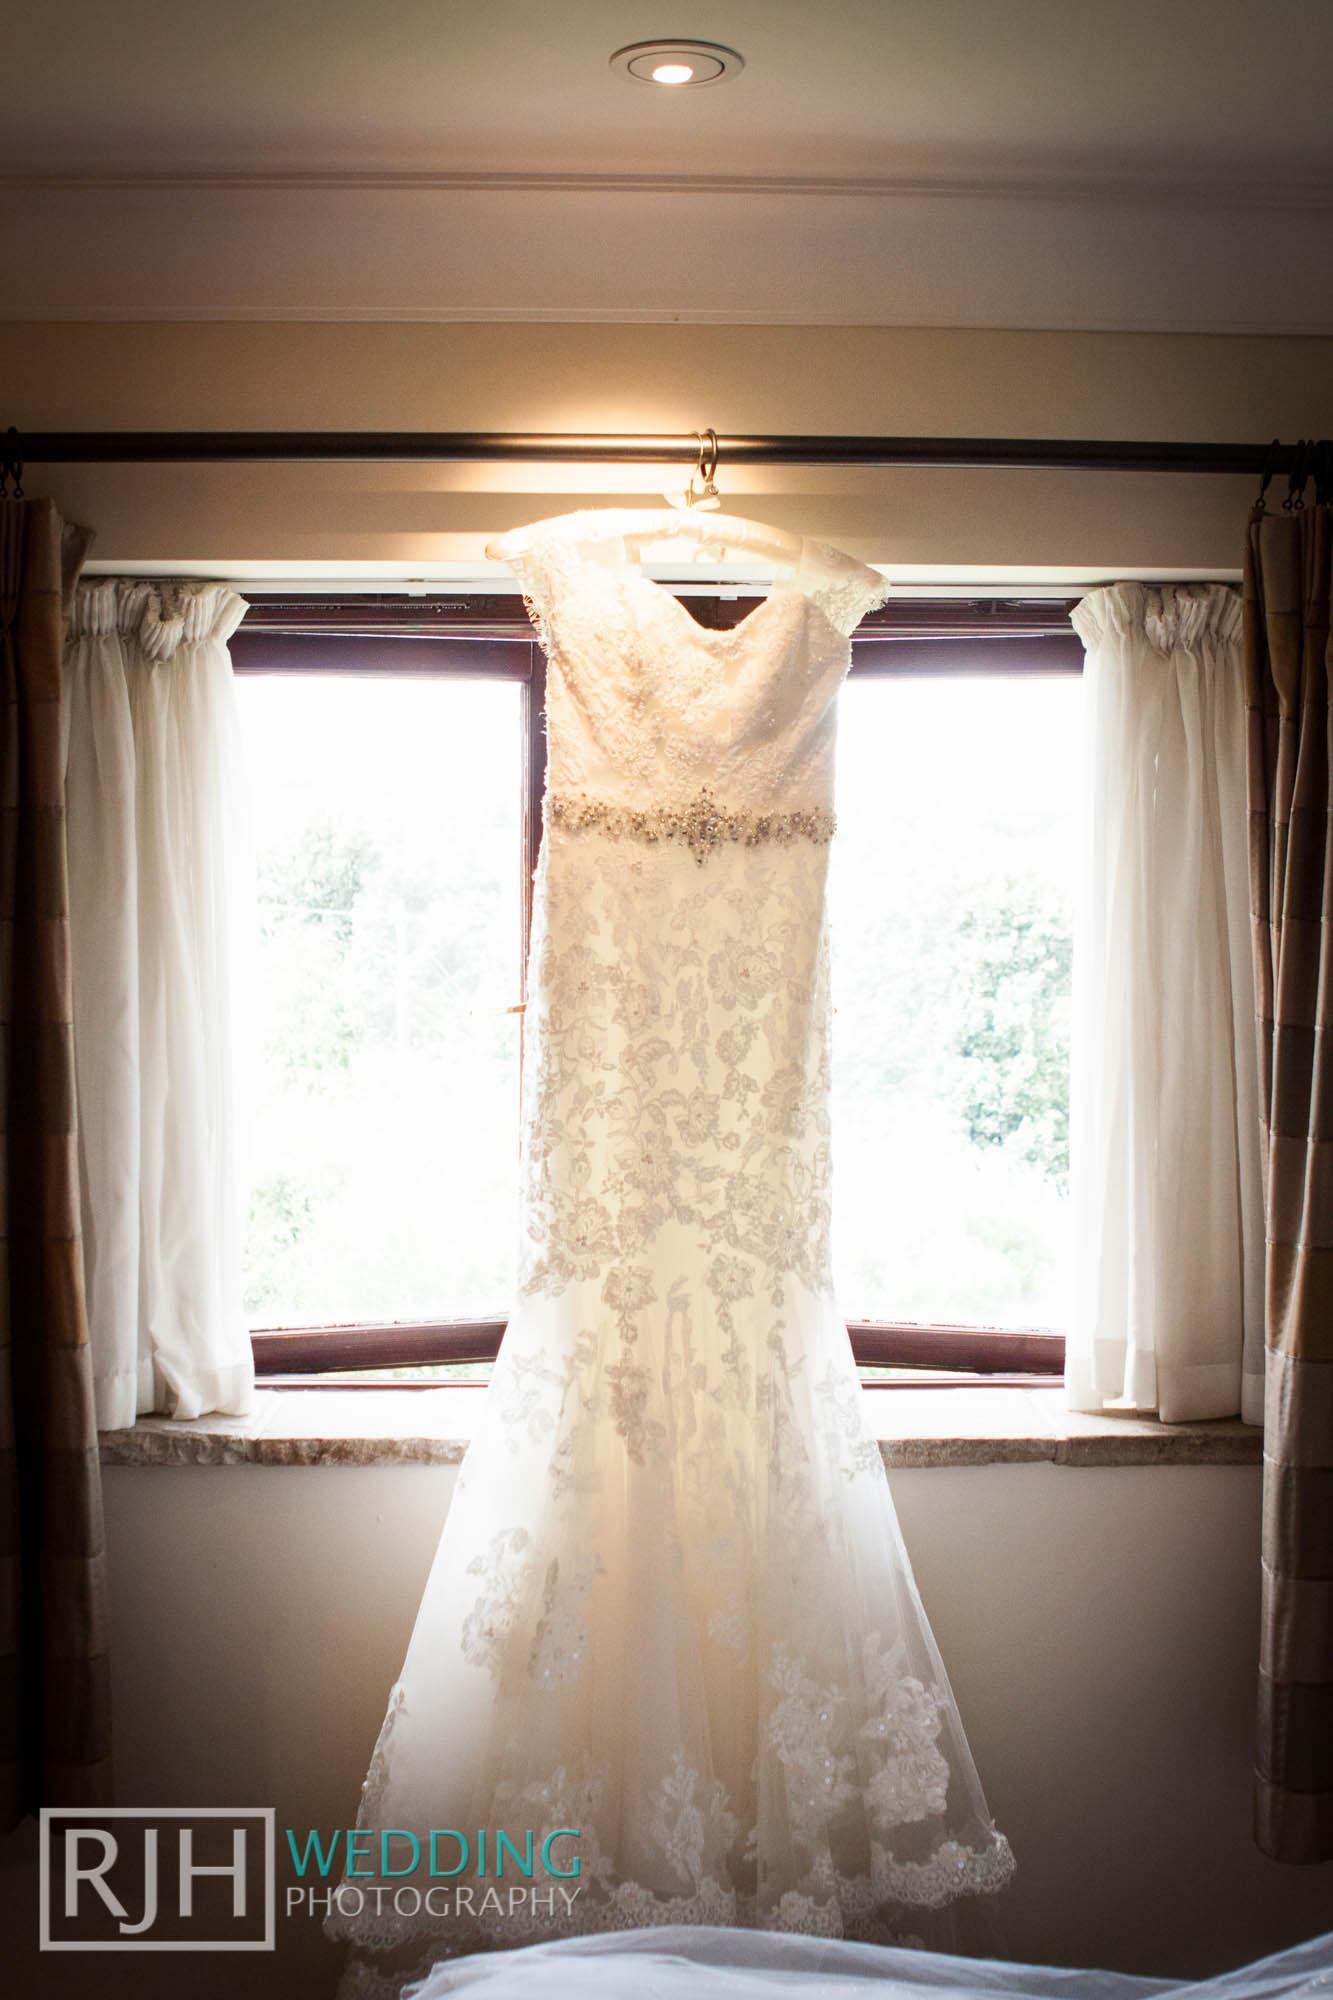 RJH Wedding Photography_Tankersley Manor Wedding_10.jpg